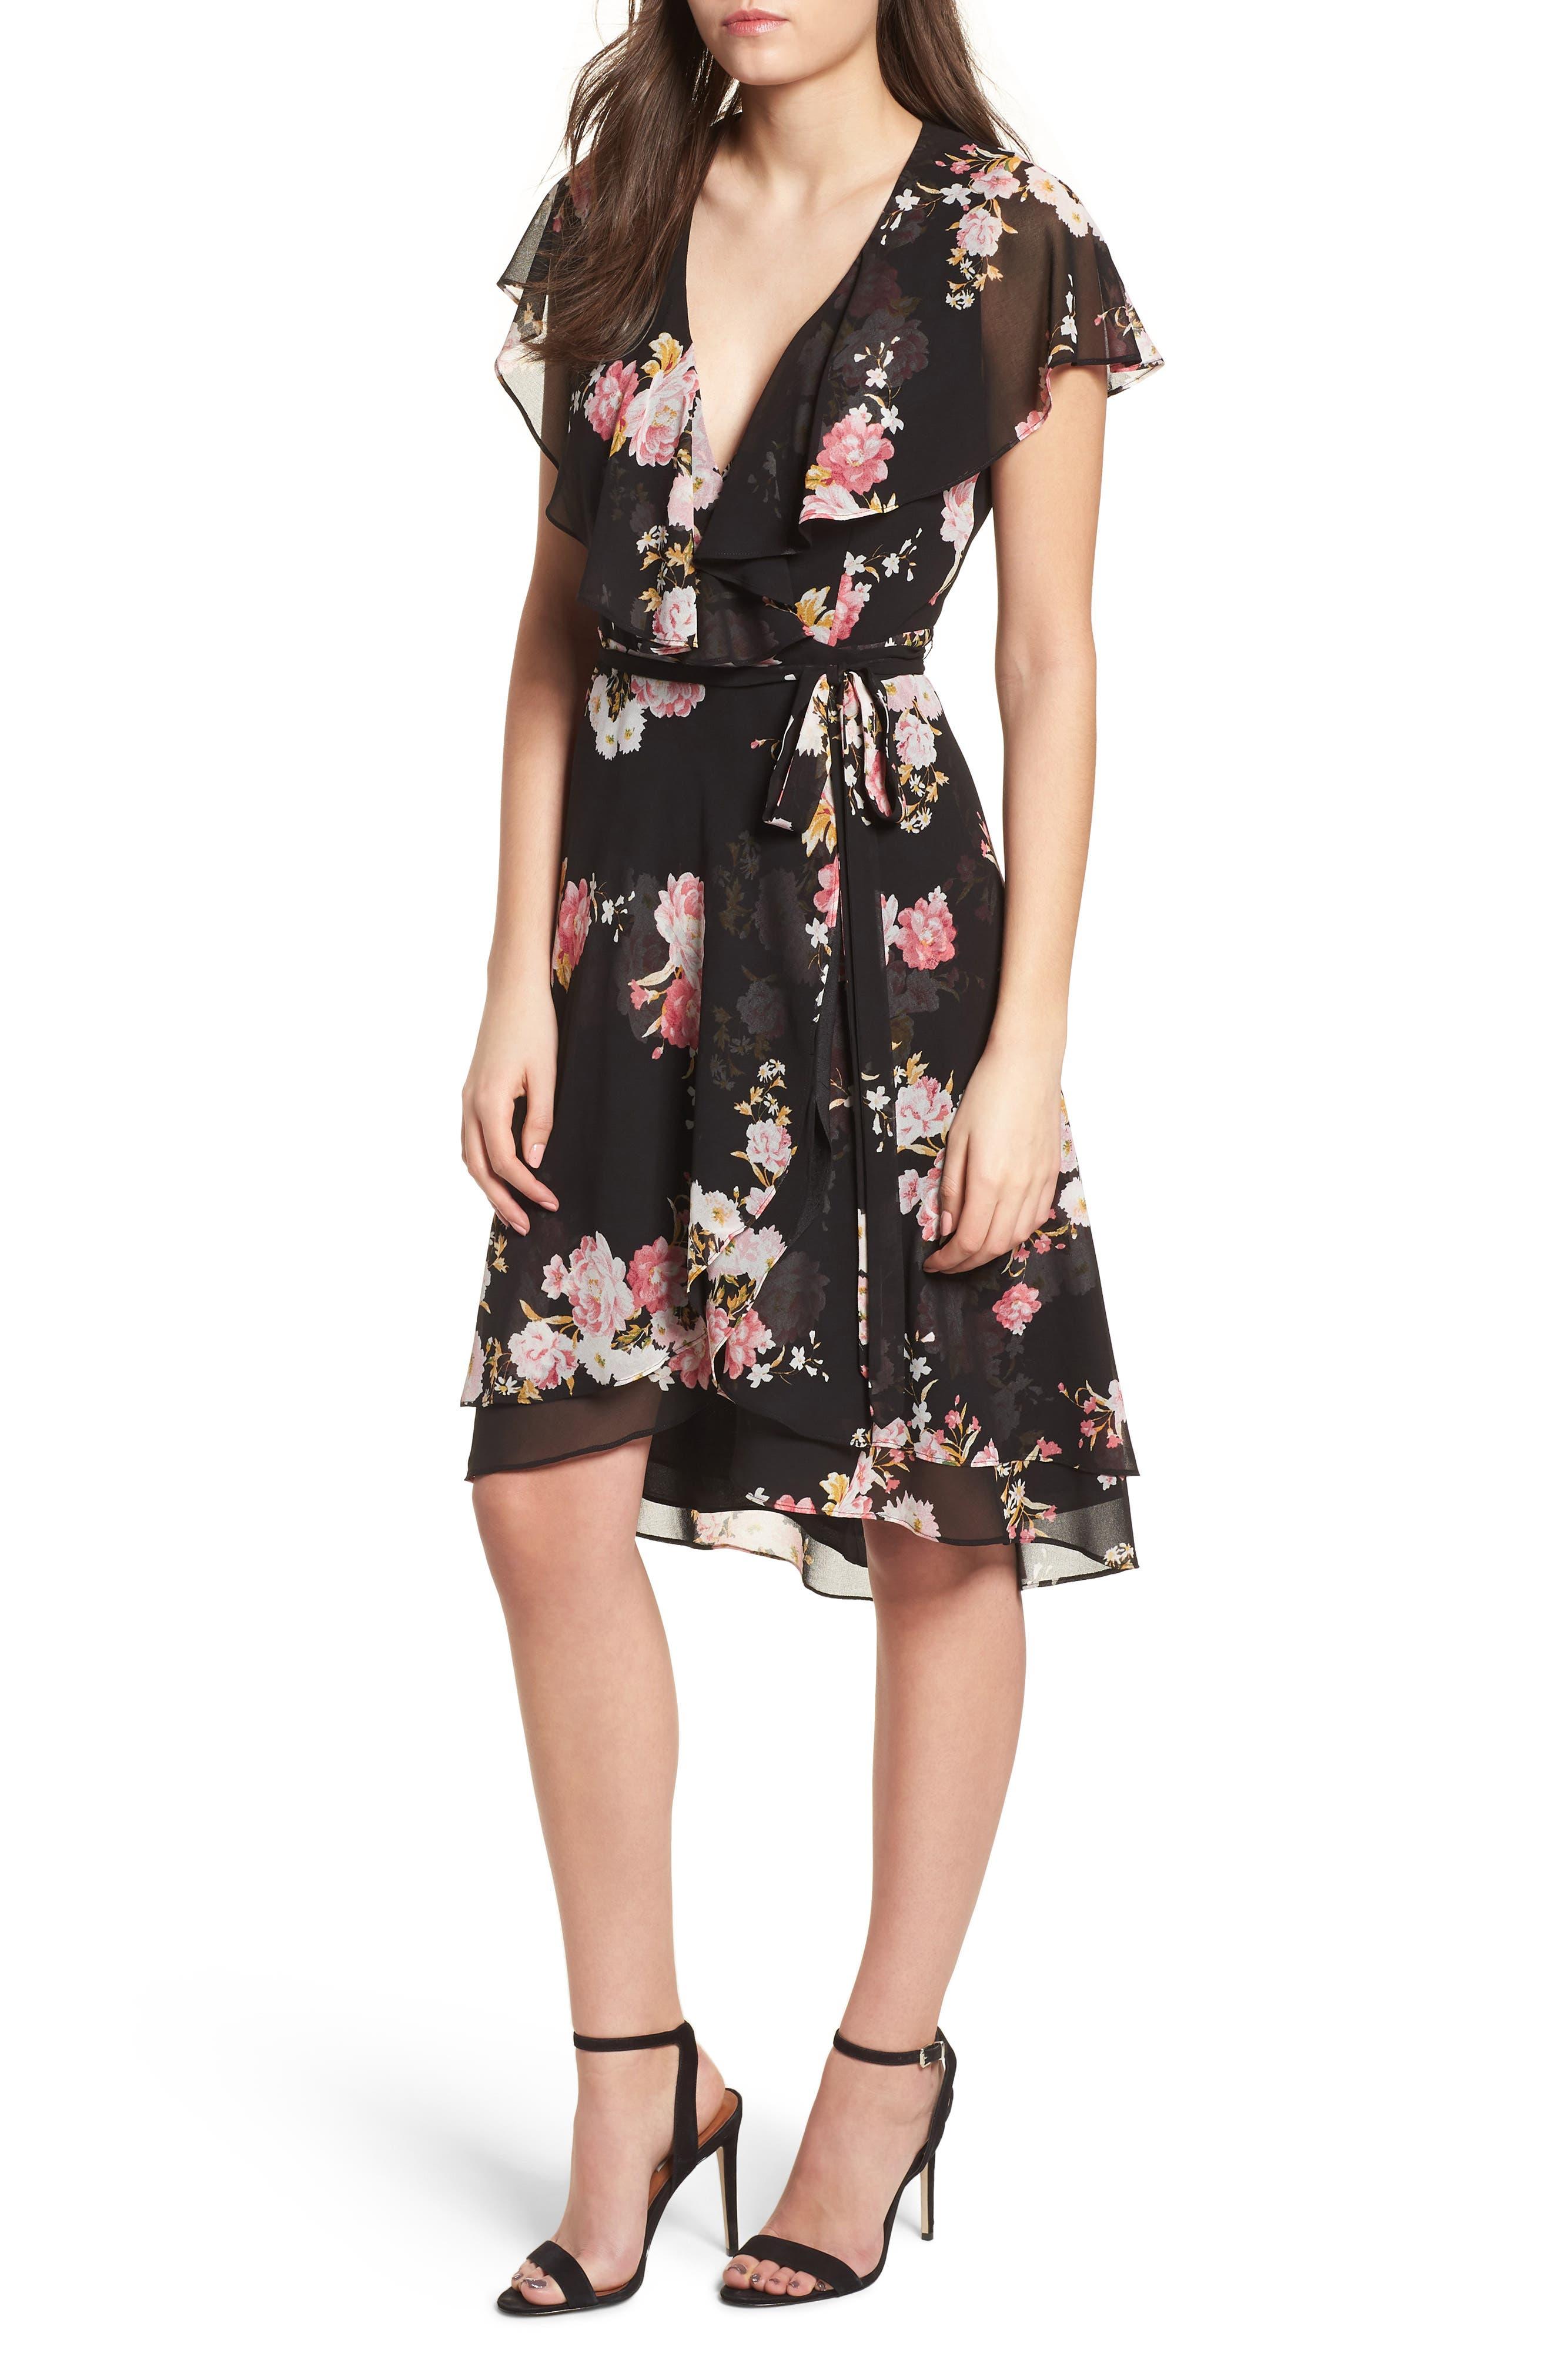 Polermo Wrap Midi Dress,                             Main thumbnail 1, color,                             Black Floral